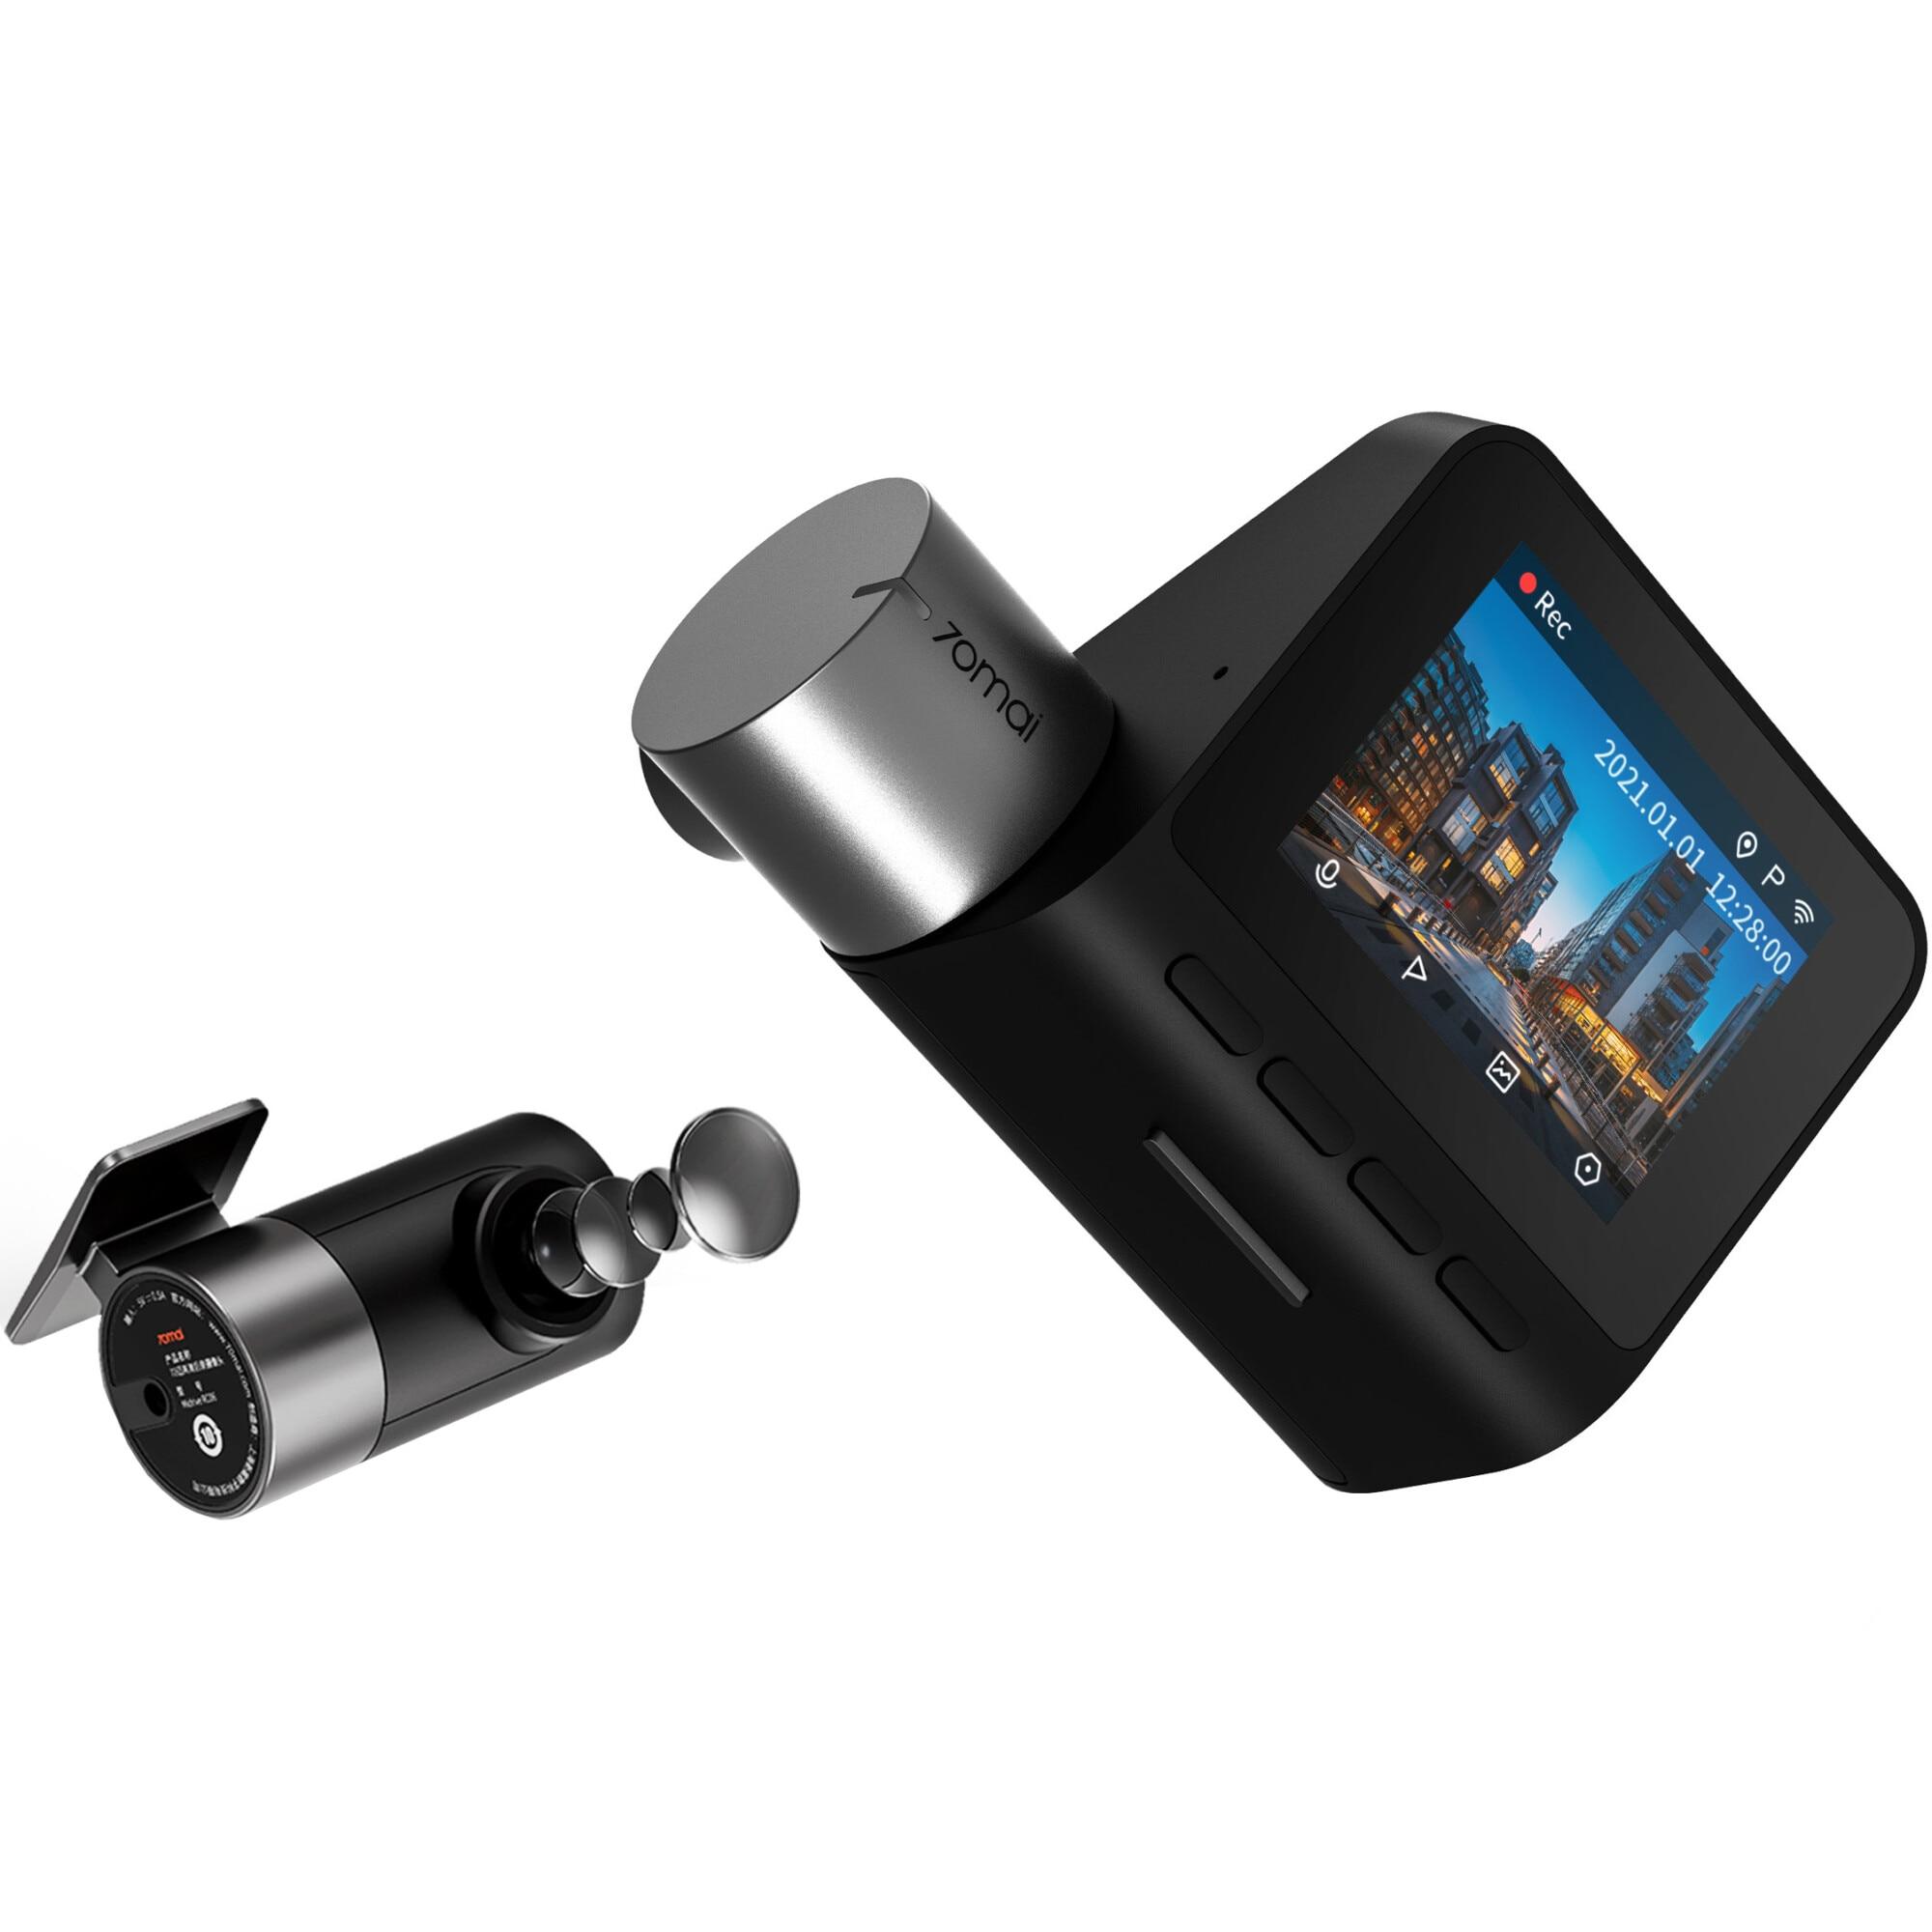 "Fotografie Camera auto DVR Xiaomi 70mai A500S Dash Cam Pro Plus 2.7K 1944p, IPS 2.0"", 140 FOV, ADAS, GPS, Night Vision, Wi-Fi + camera spate Xiaomi 70mai RC06 full HD la 30 fps, unghi vizualizare 130°"